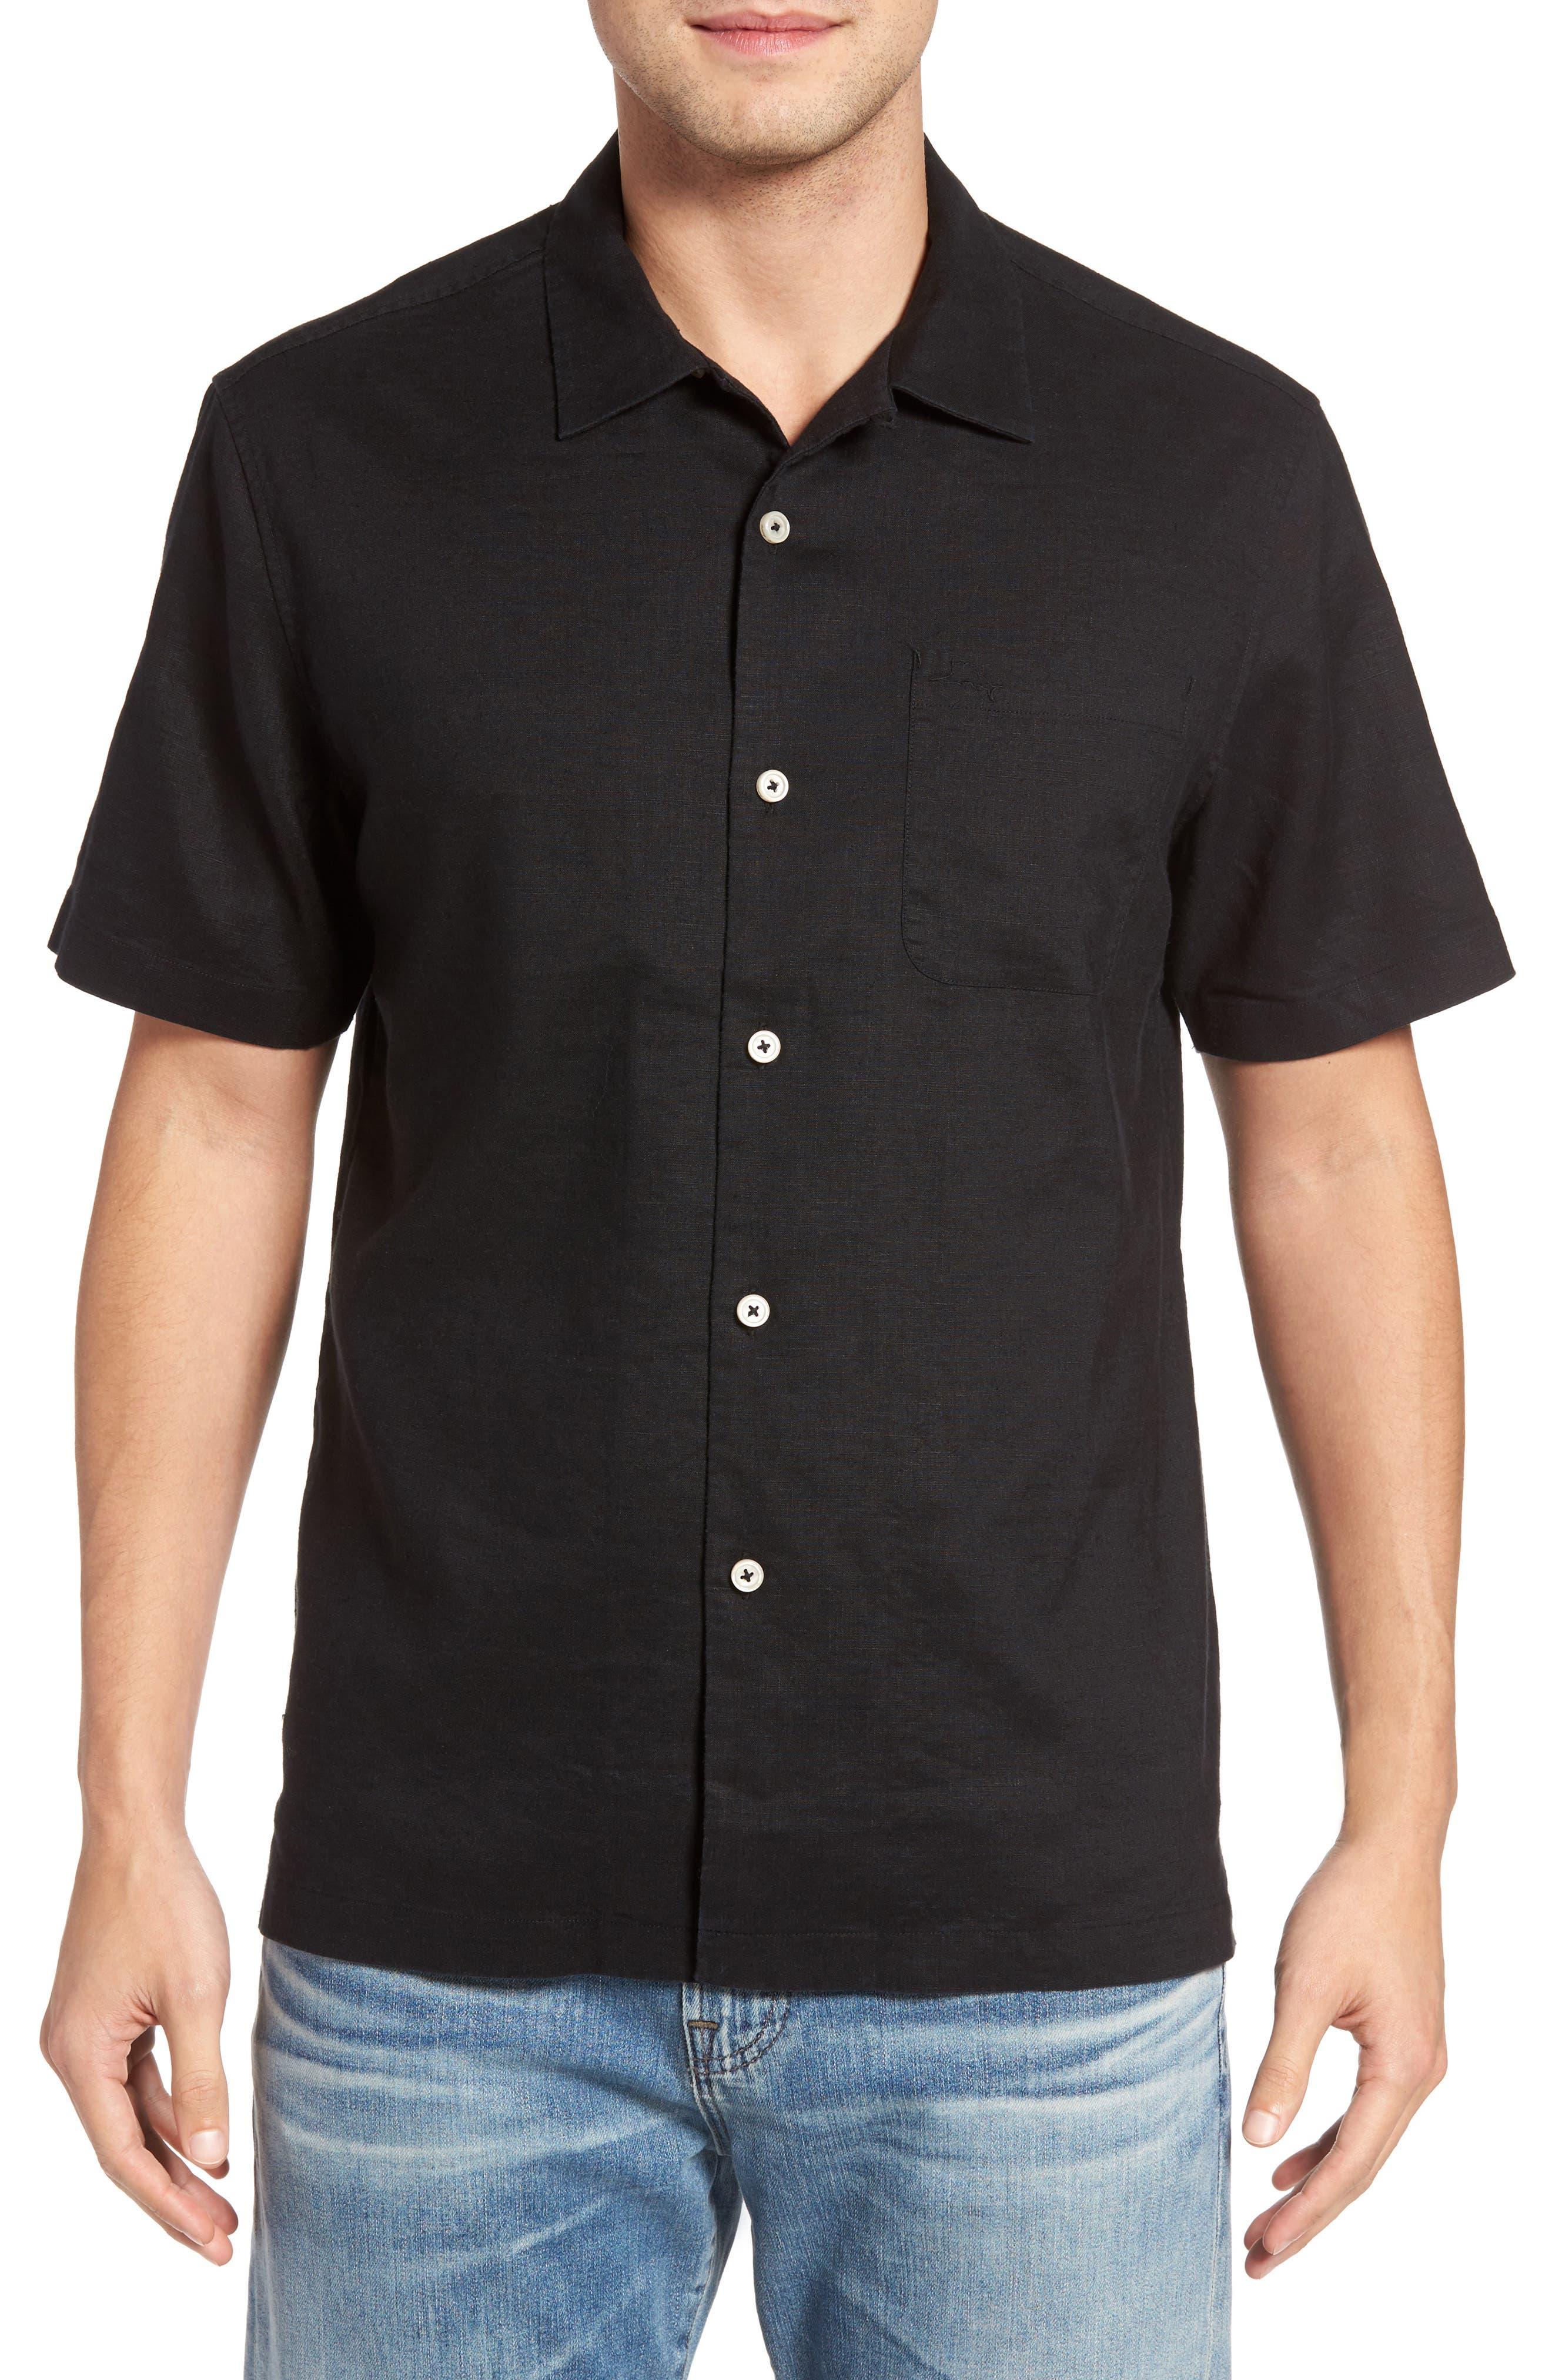 Main Image - Tommy Bahama Monaco Tides Standard Fit Linen Blend Camp Shirt